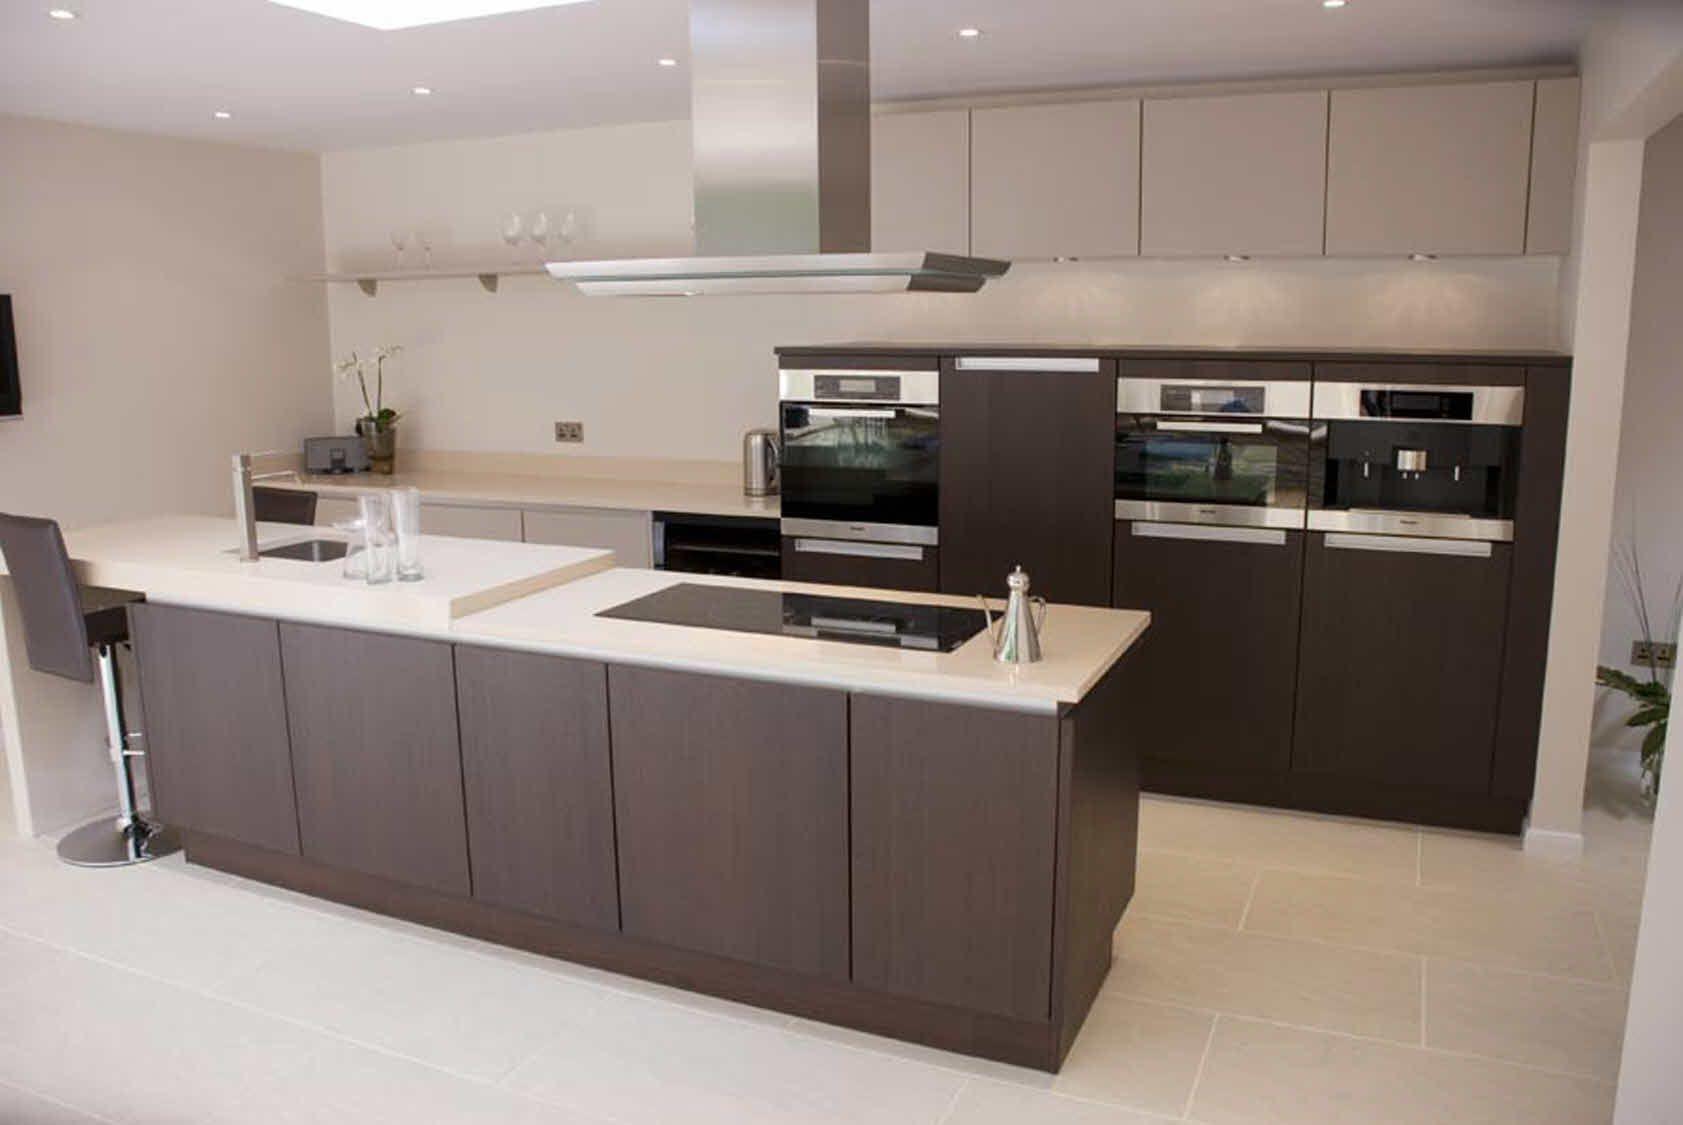 Chocolate and Cream custom built Poggenpohl kitchen. The ...